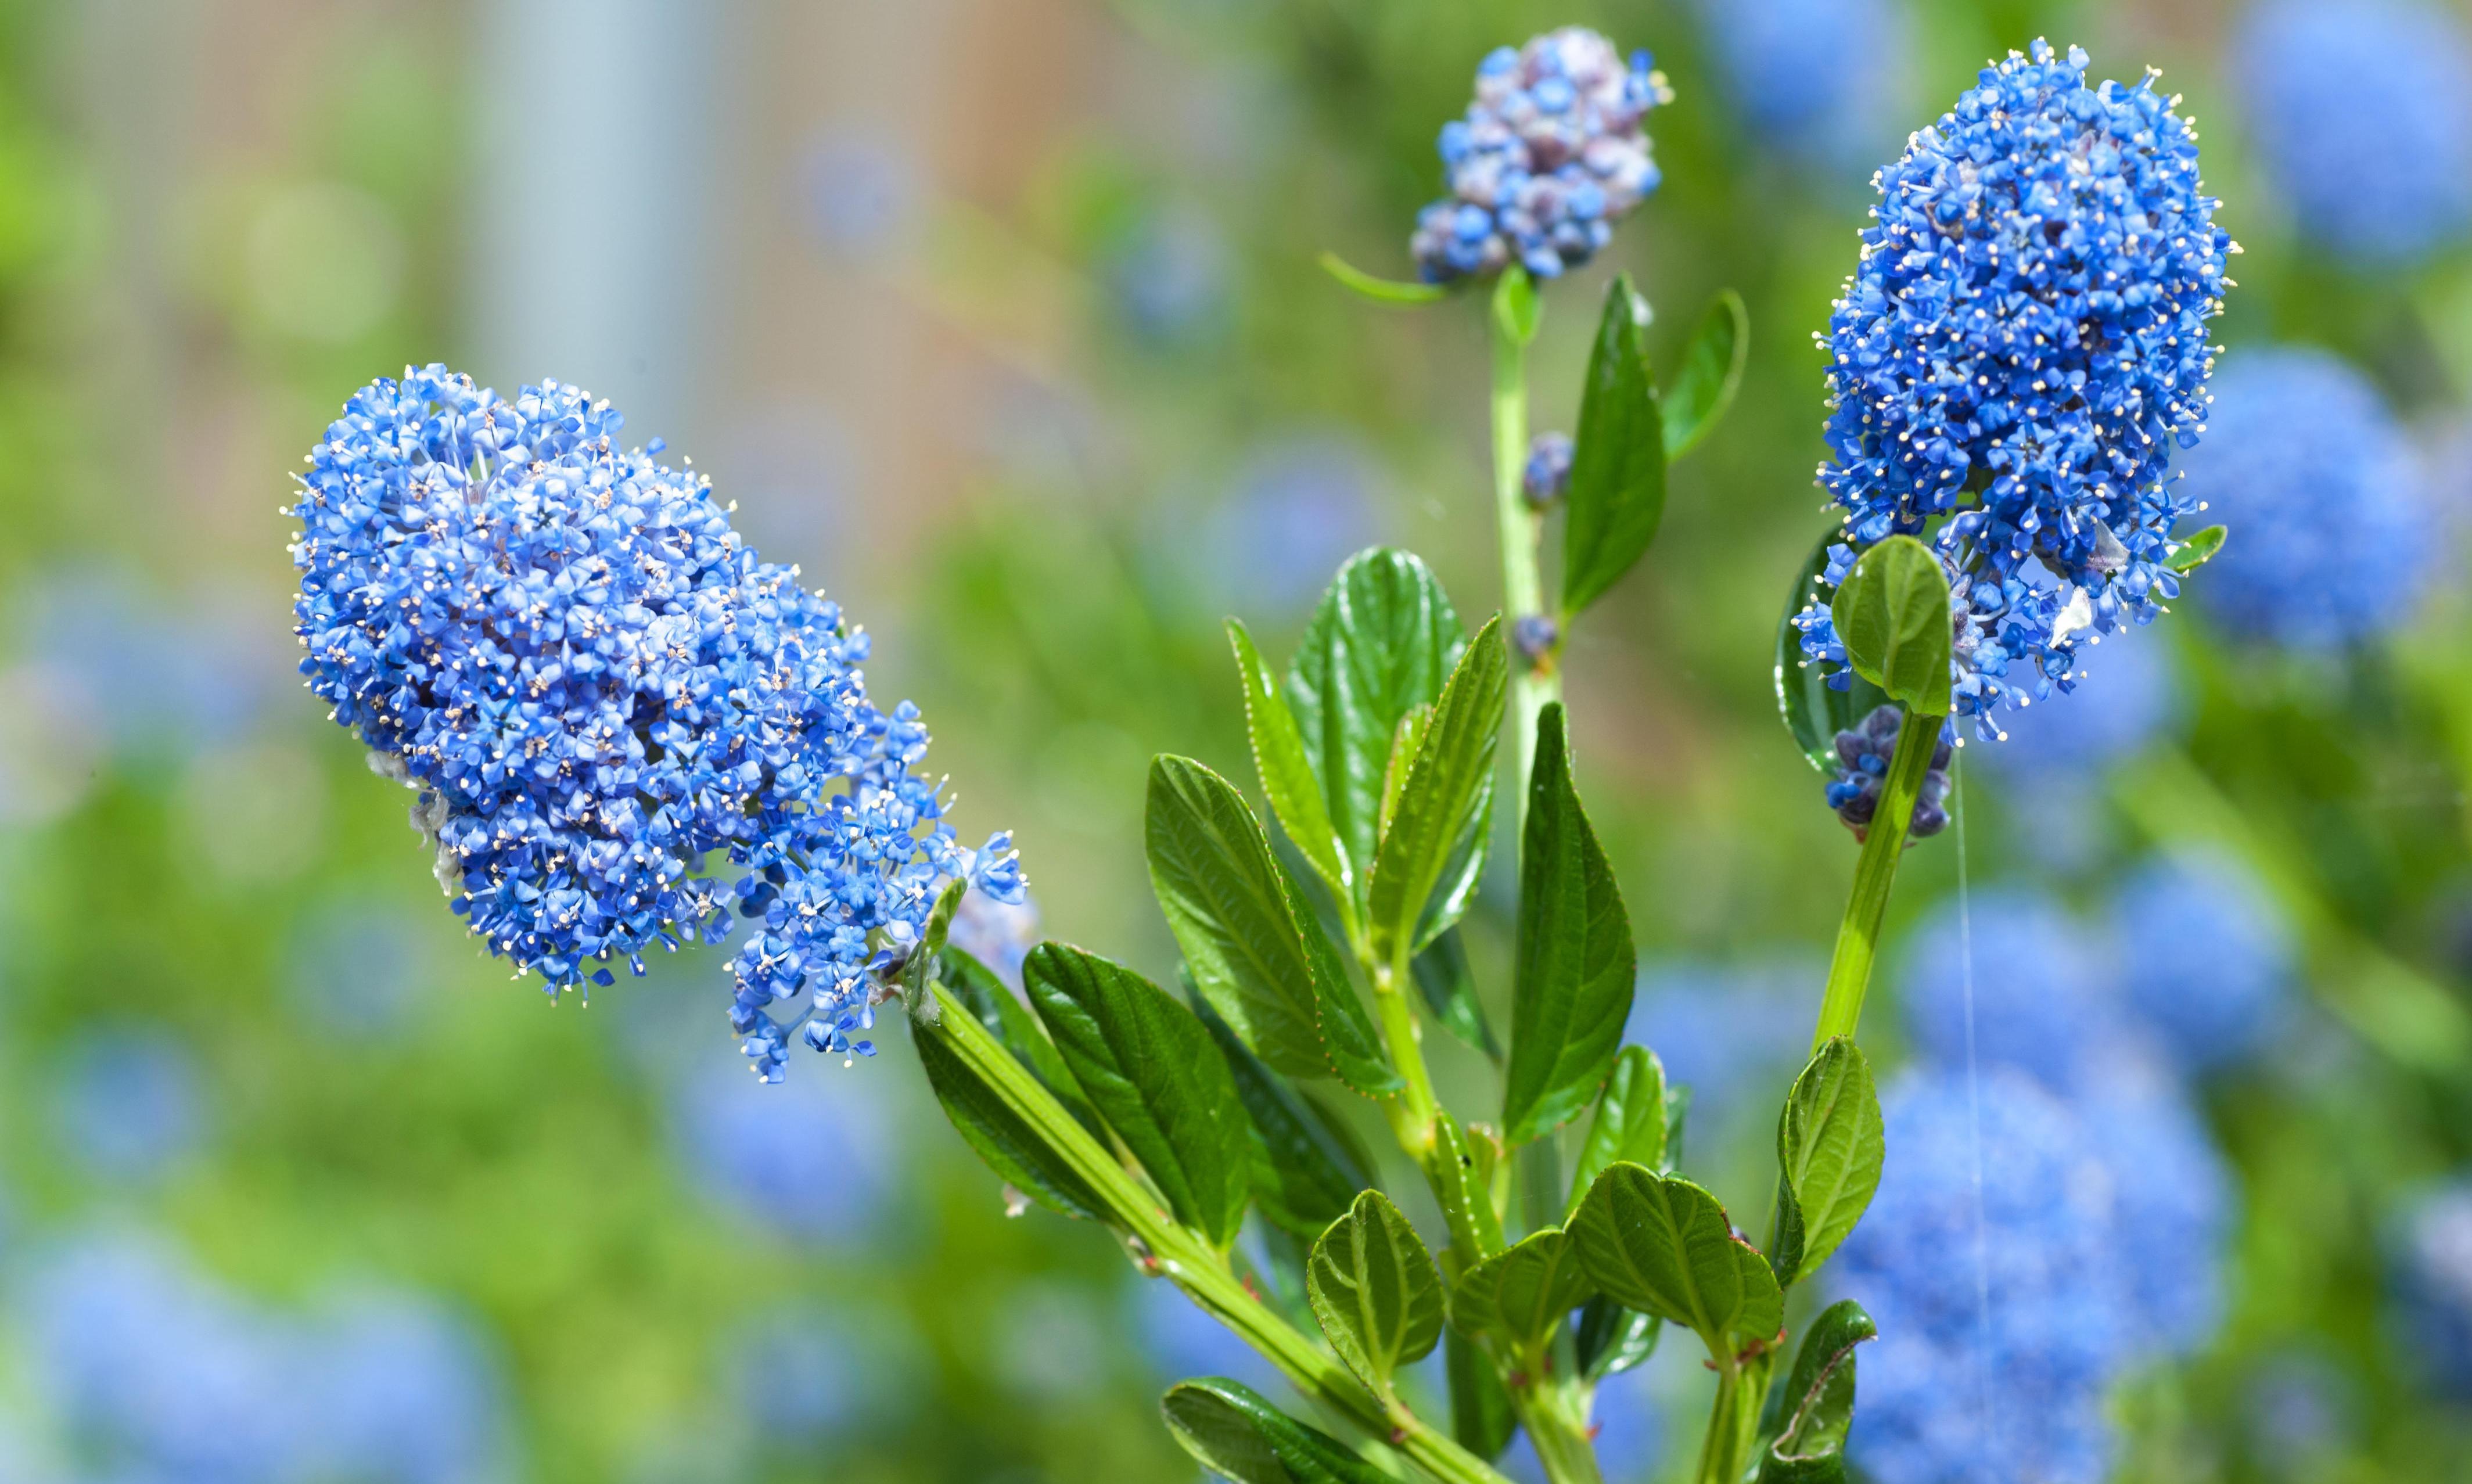 Gardening tips: plant sun-loving ceanothus